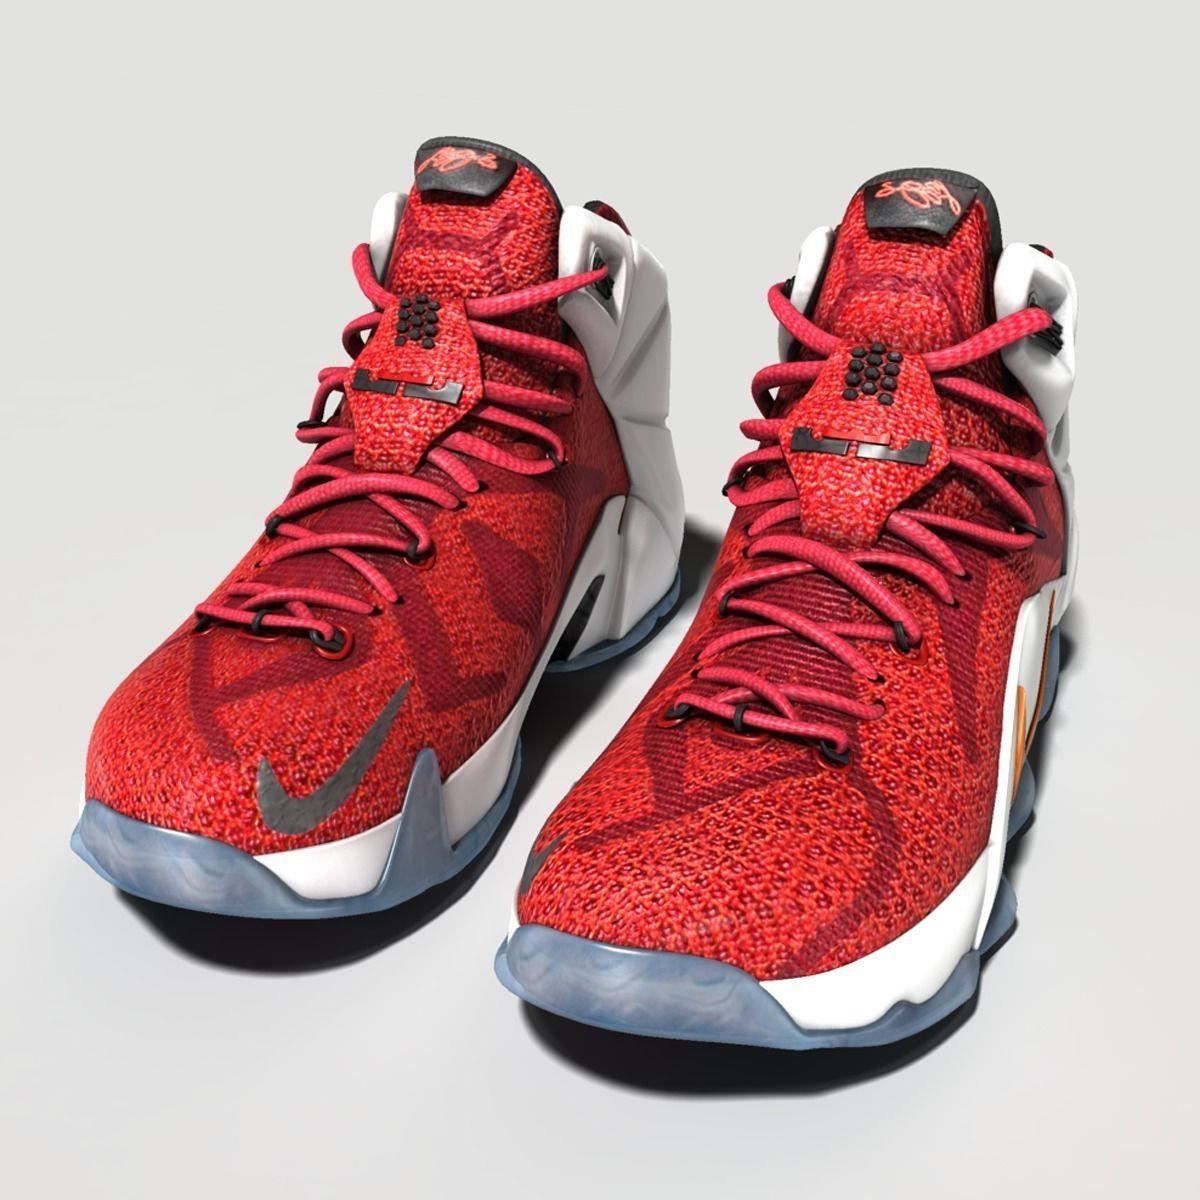 New Lebron James 12 Shoes 3D Model .obj .fbx .ma .mb ...